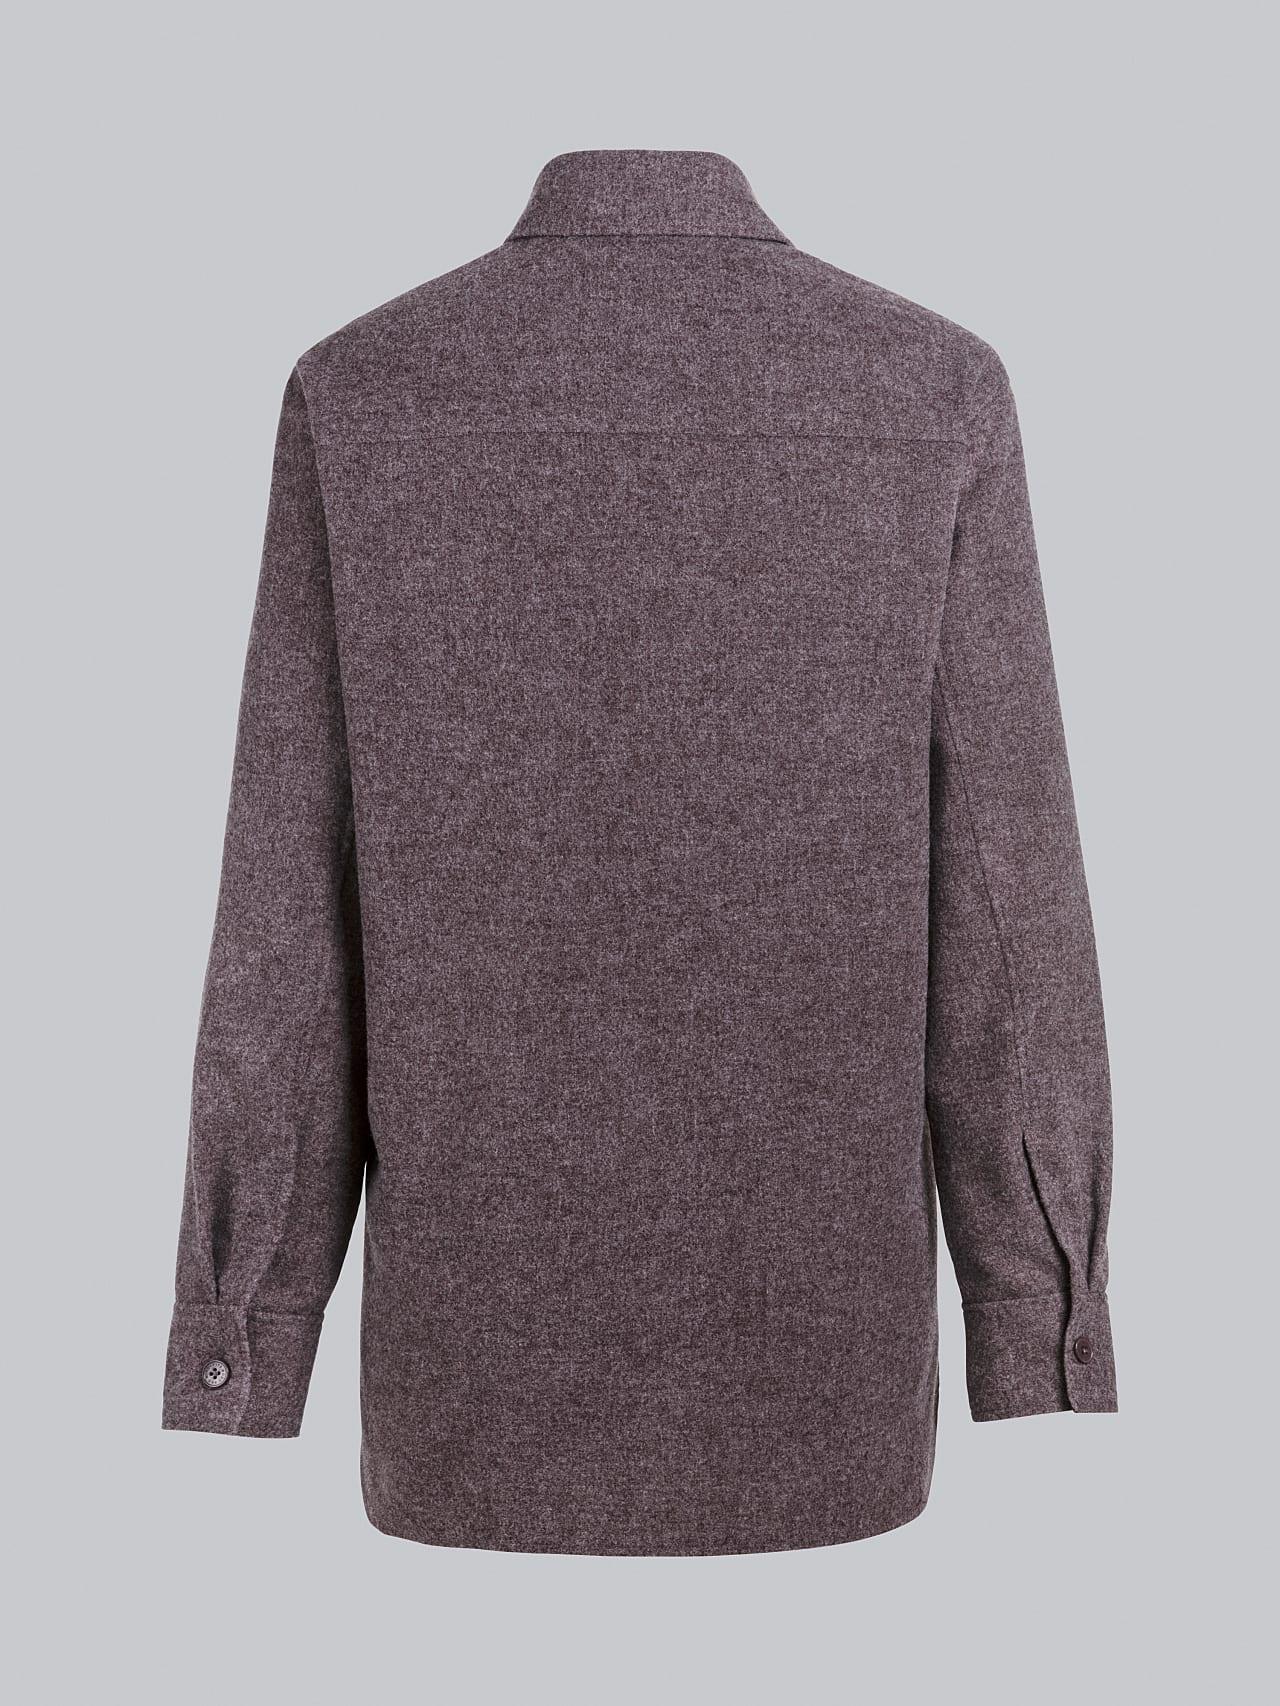 WOVIE V1.Y5.02 Wool Over-Shirt Burgundy Left Alpha Tauri